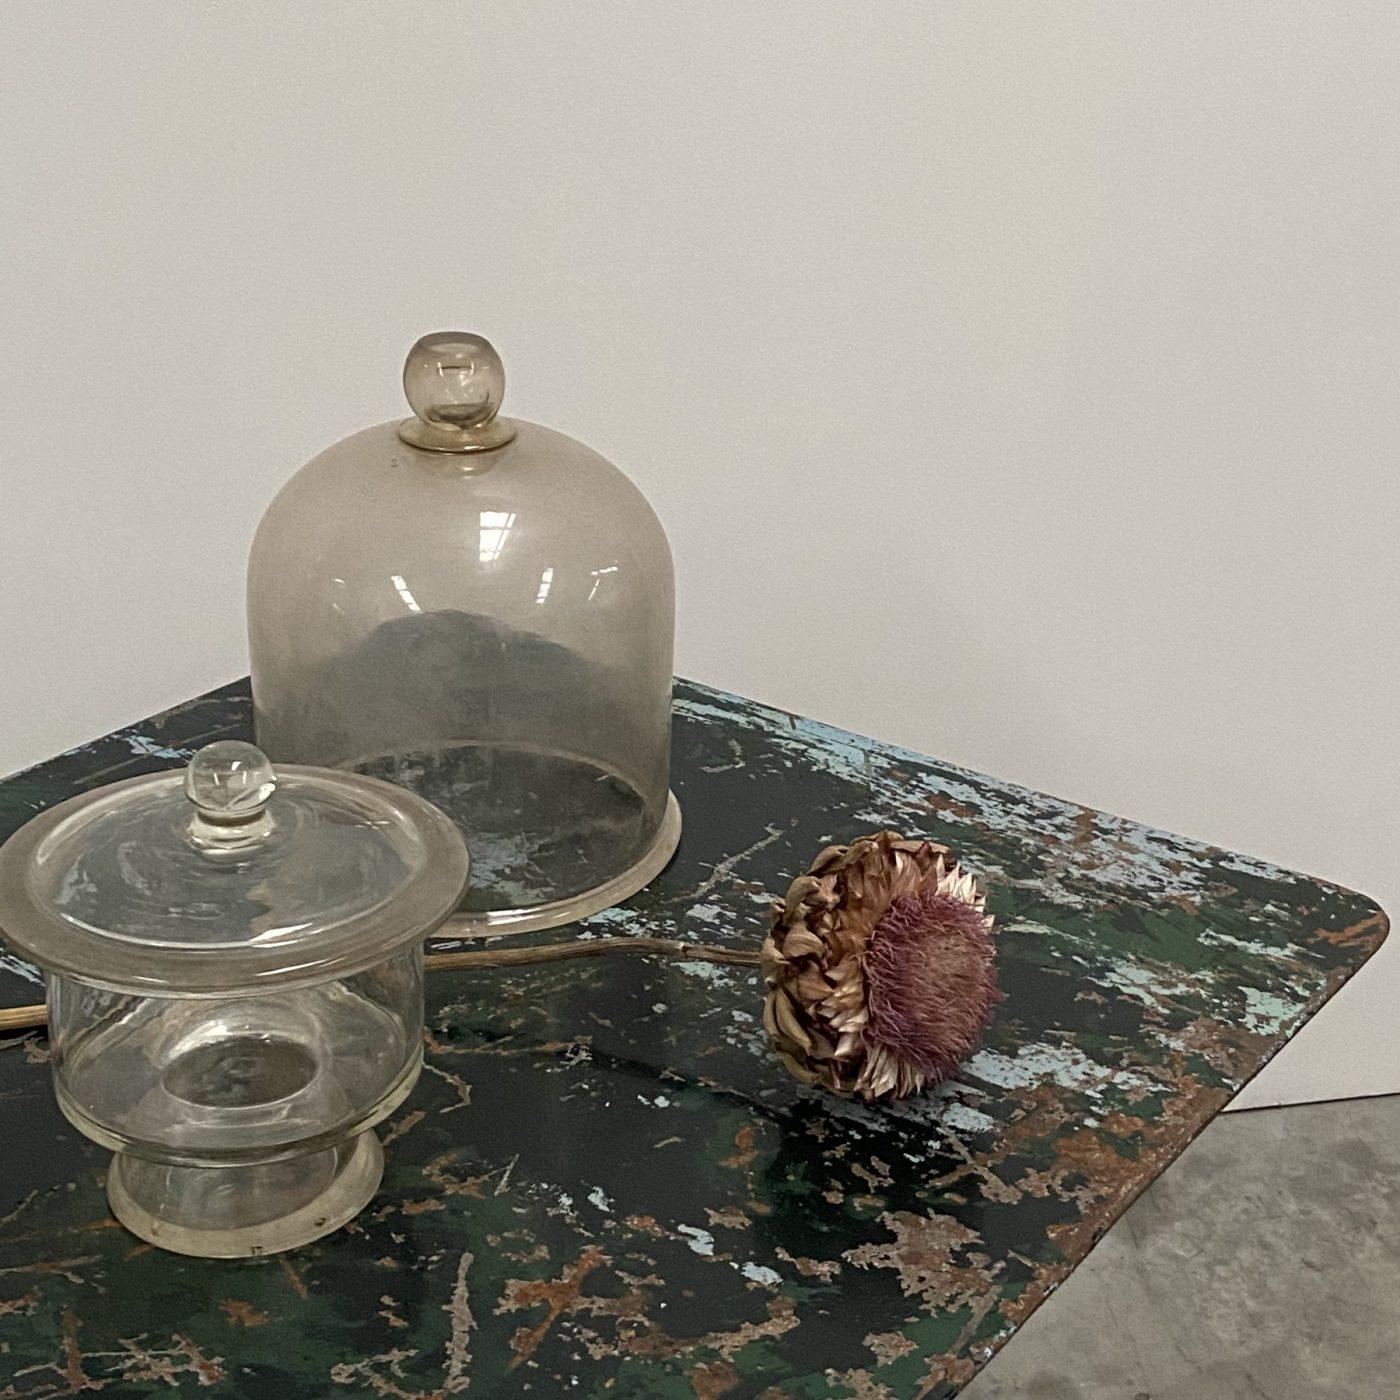 objet-vagabond-garden-table0000